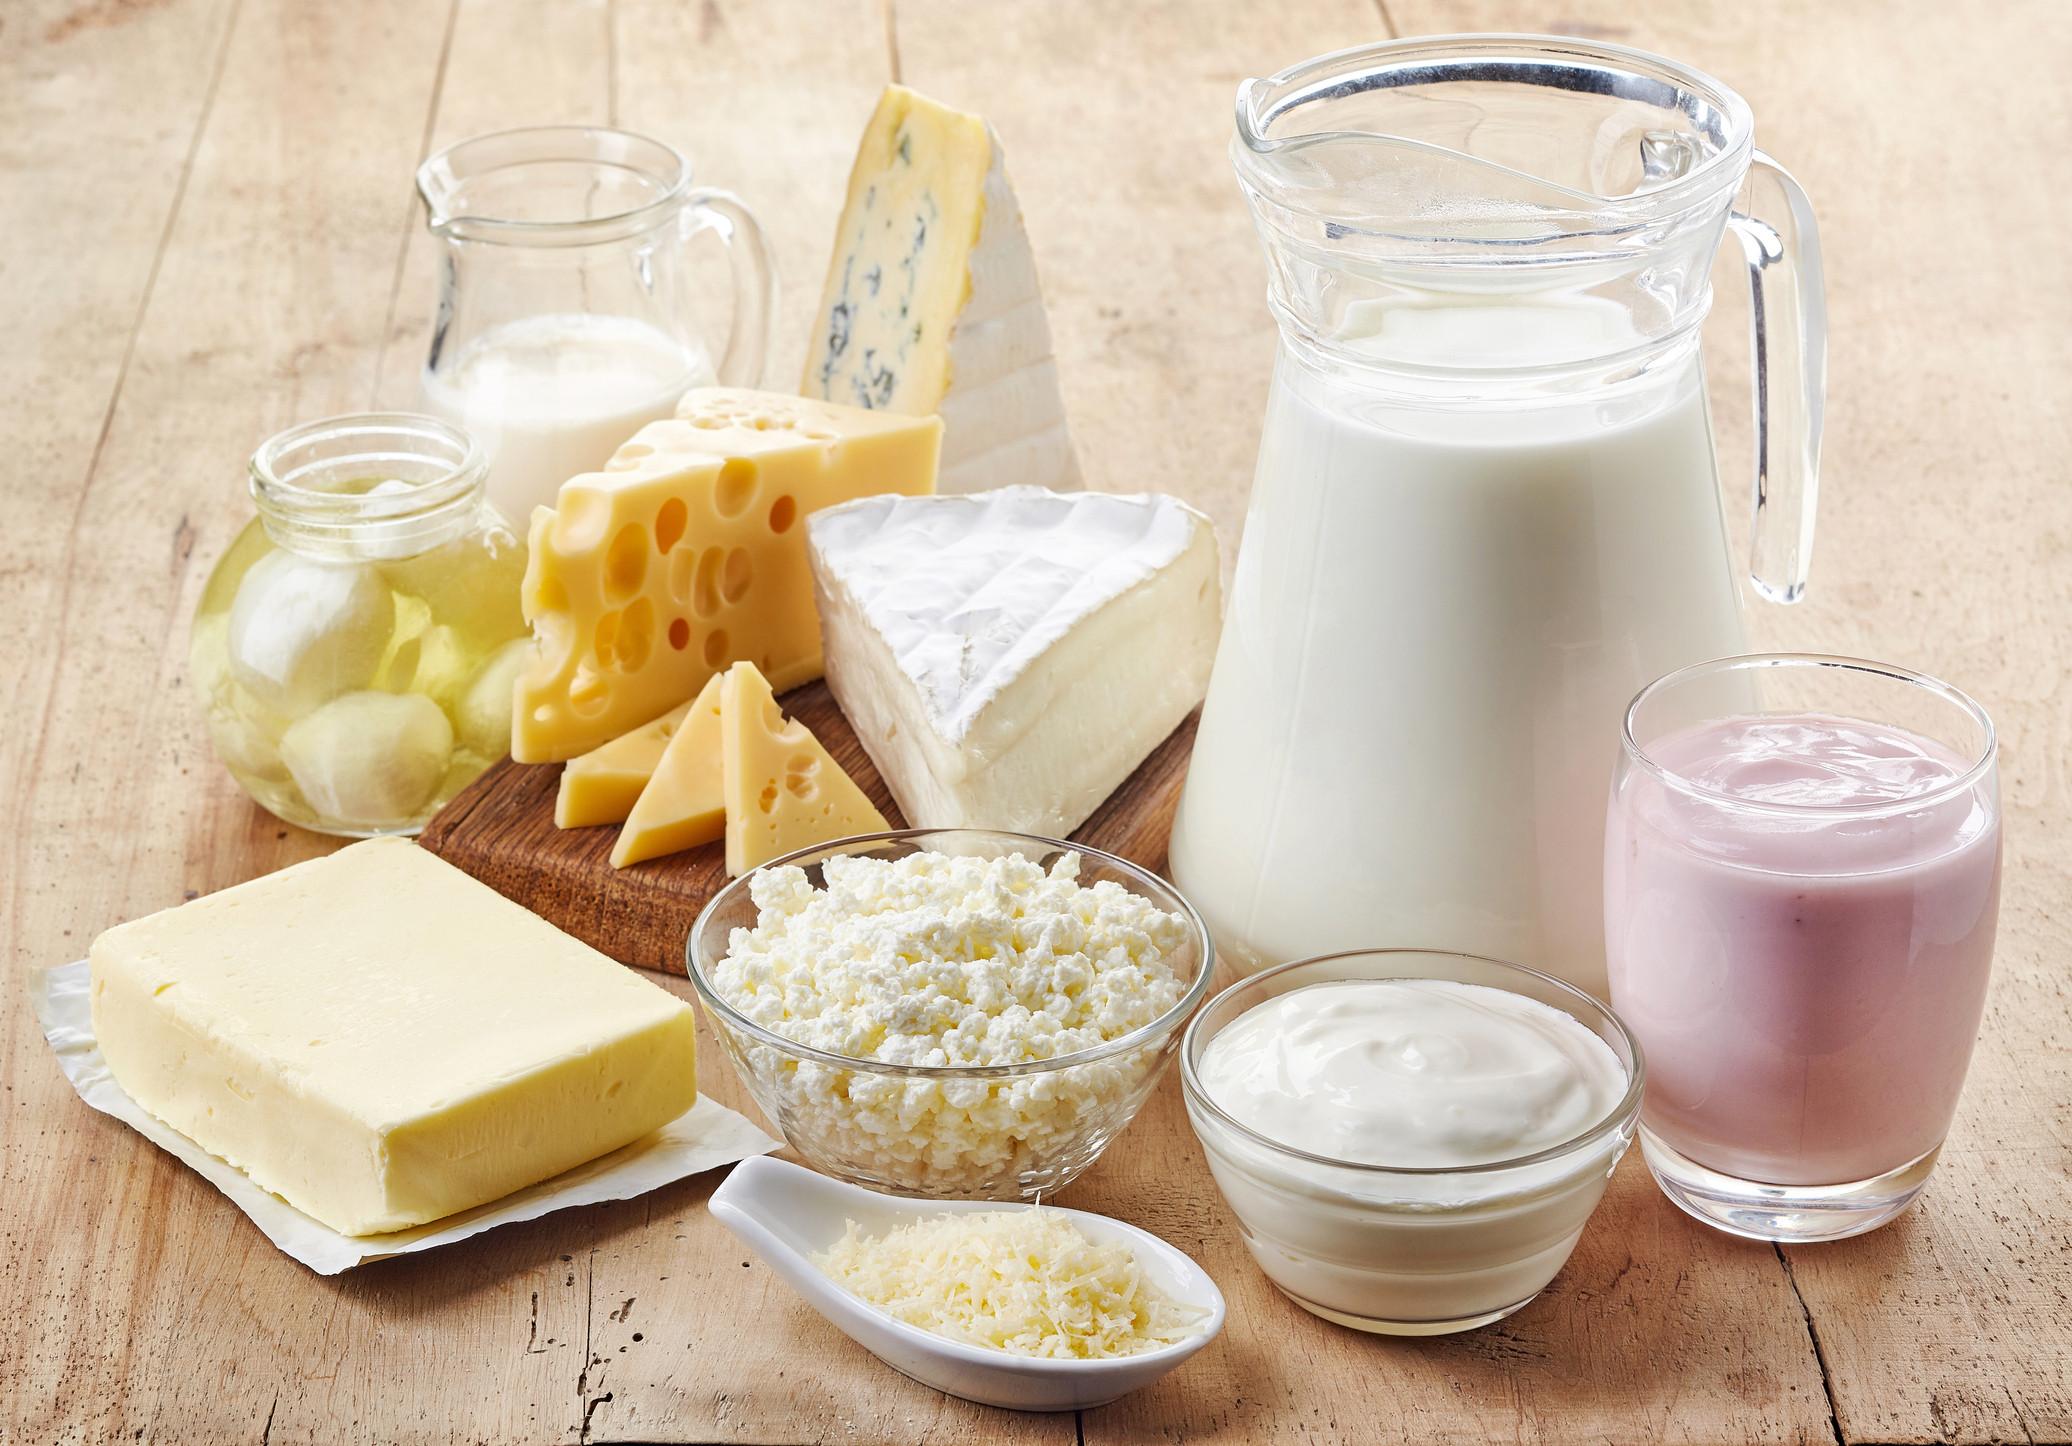 Dairy: Health food or health risk? - Harvard Health